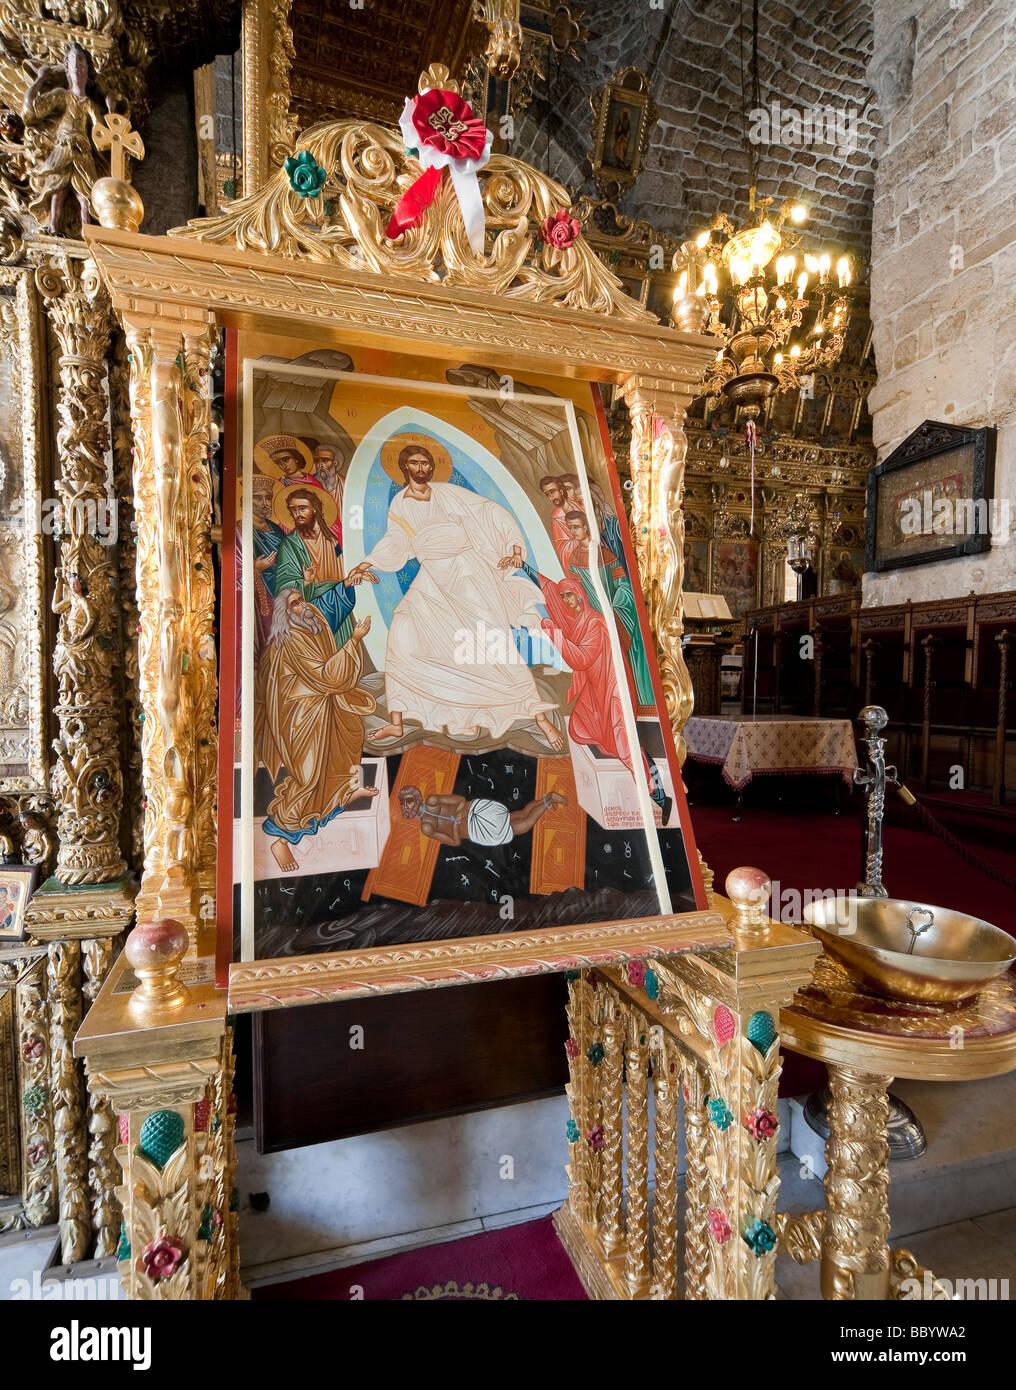 A painted biblical scene, Lazarus Church, Agios Lazaros, Larnaca, Southern Cyprus, Cyprus, greek part, Europe - Stock Image